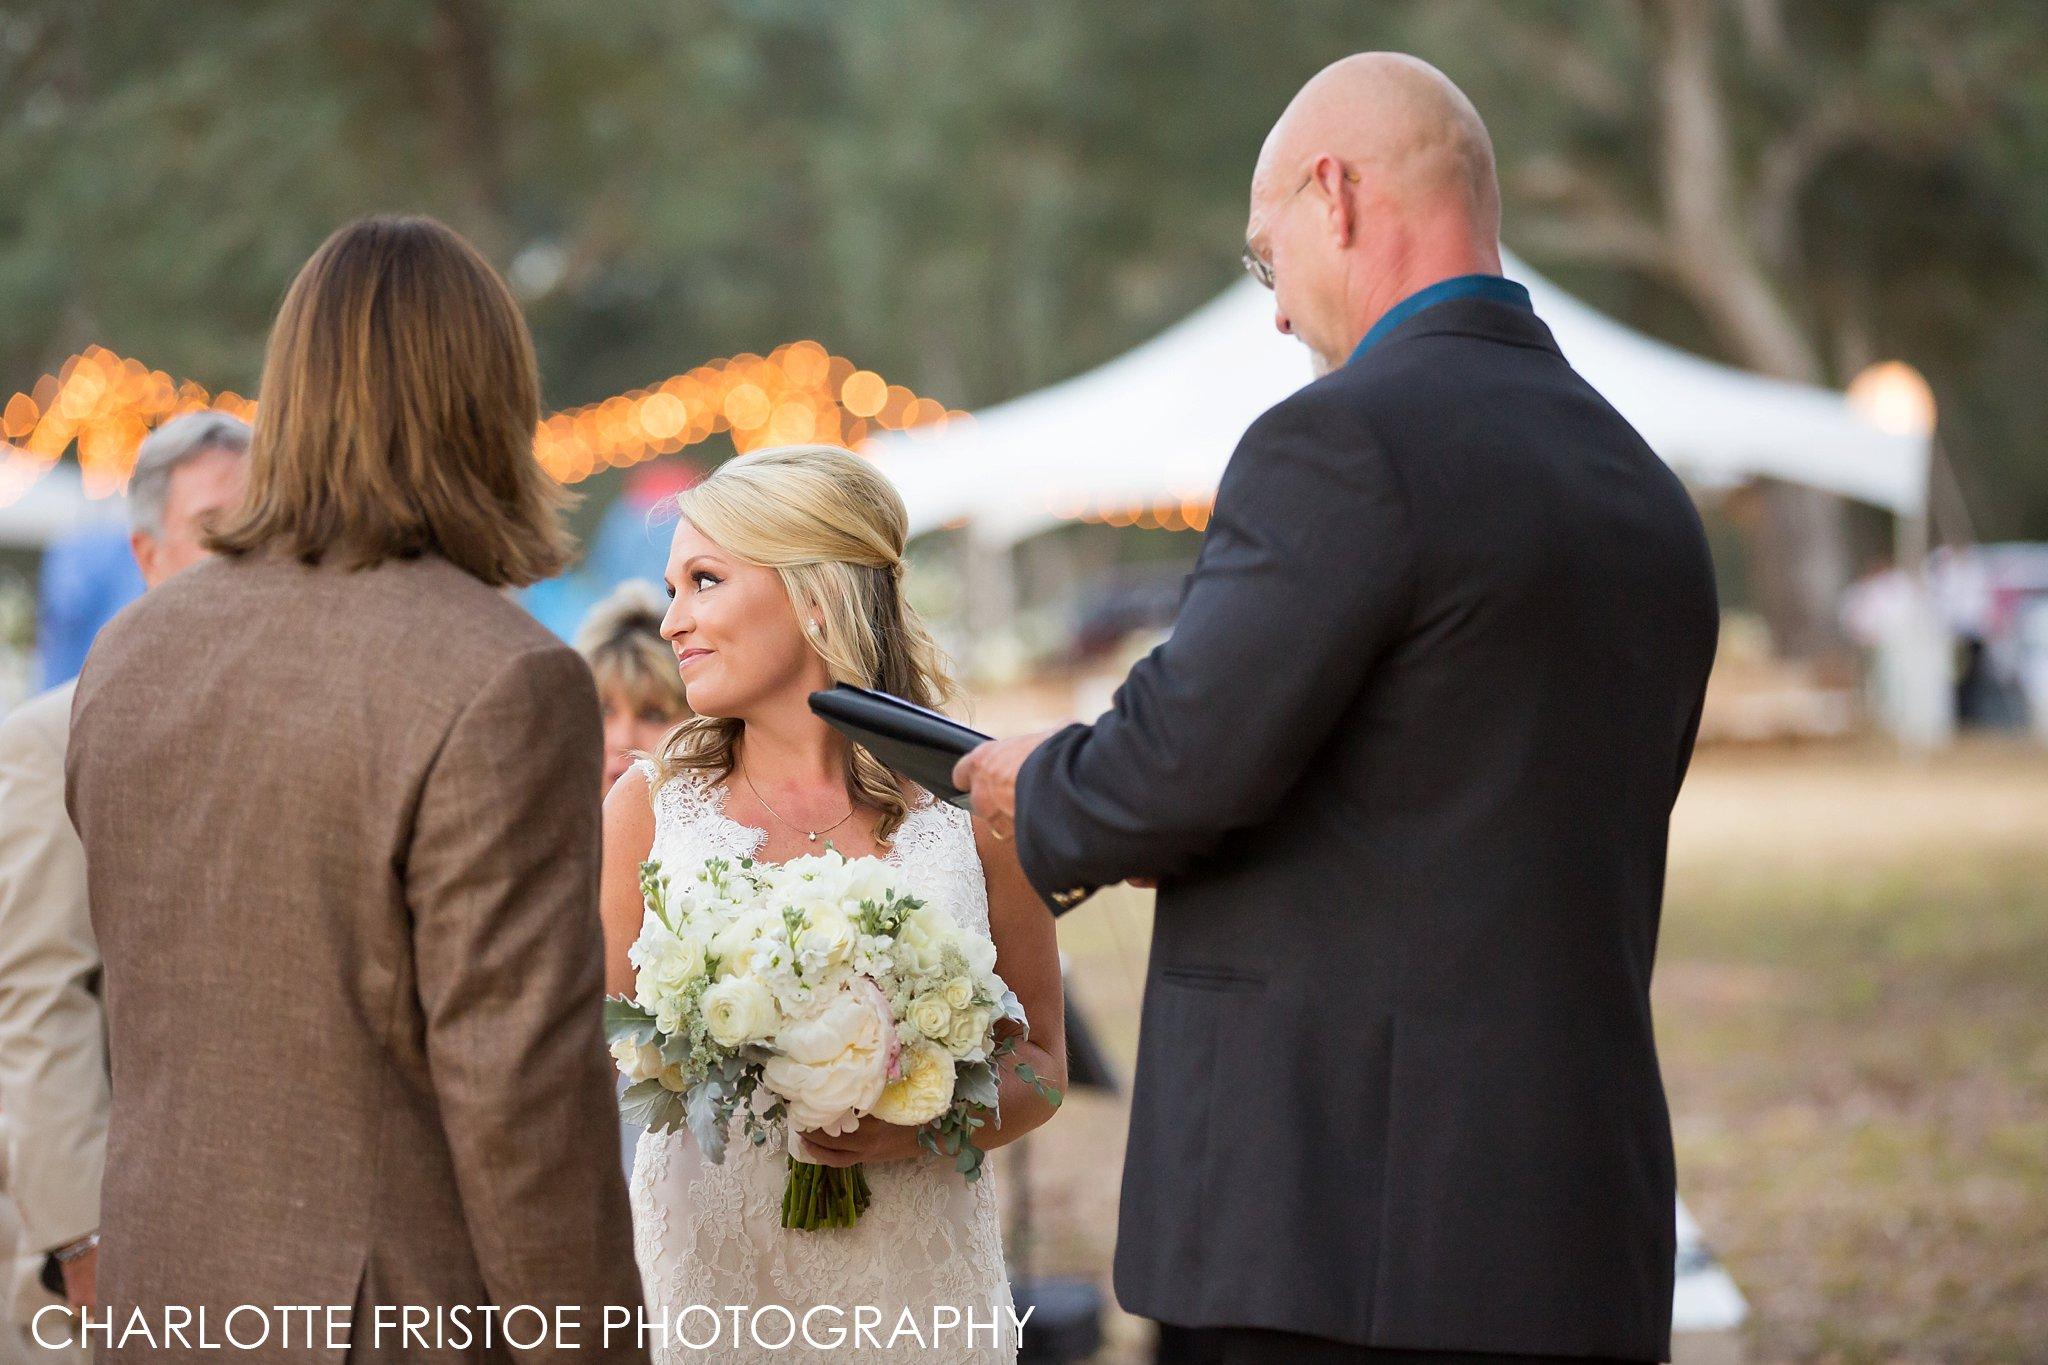 Charlotte Fristoe Photography-43.jpg